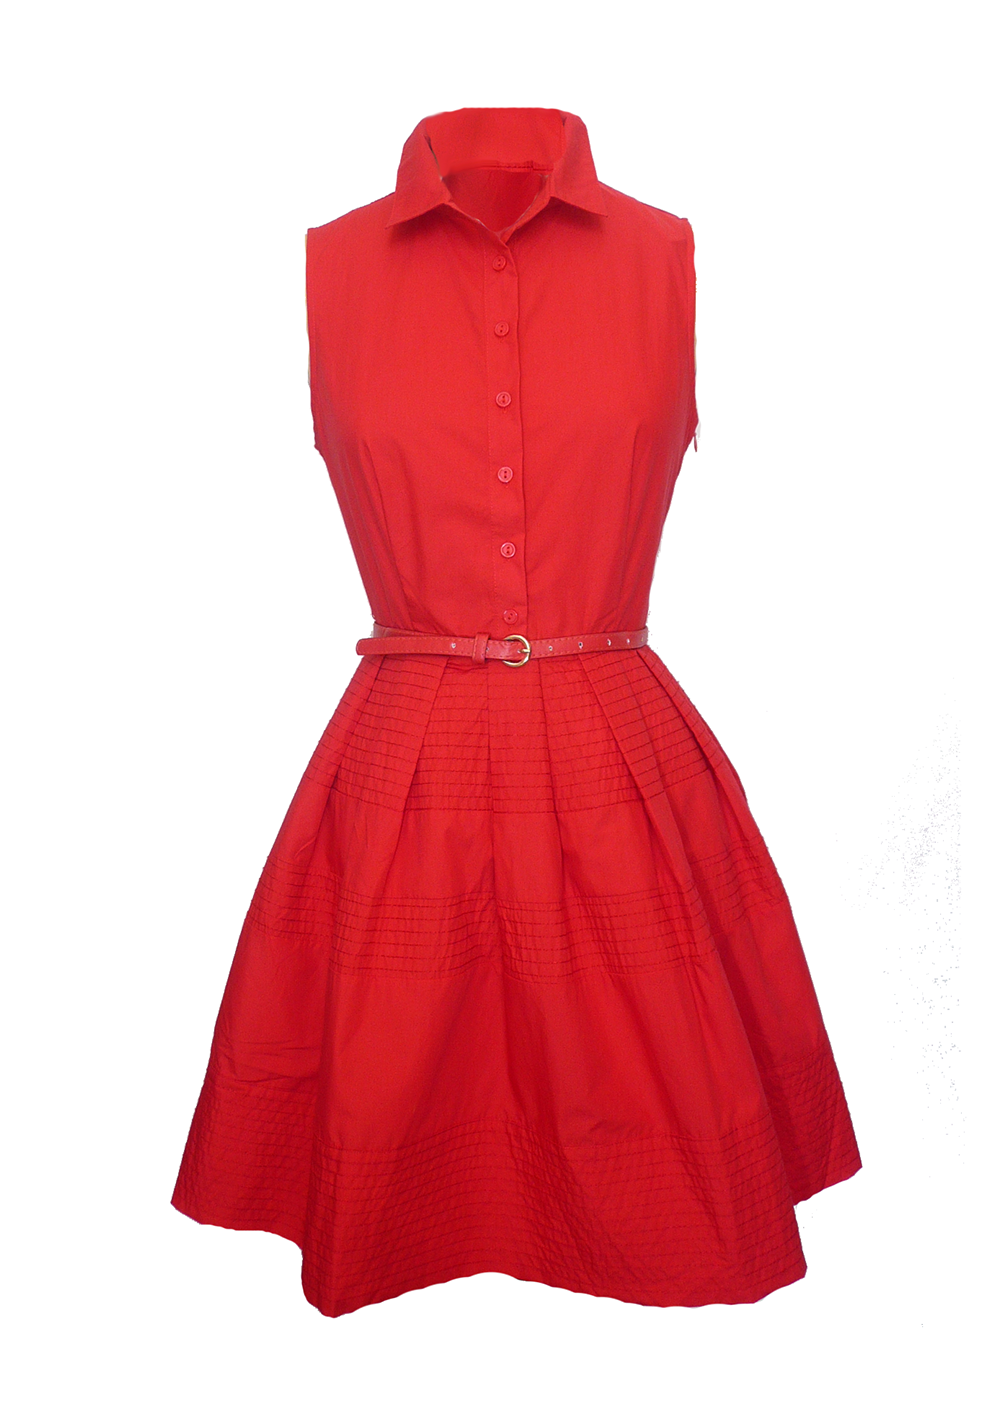 red shirt dress.png